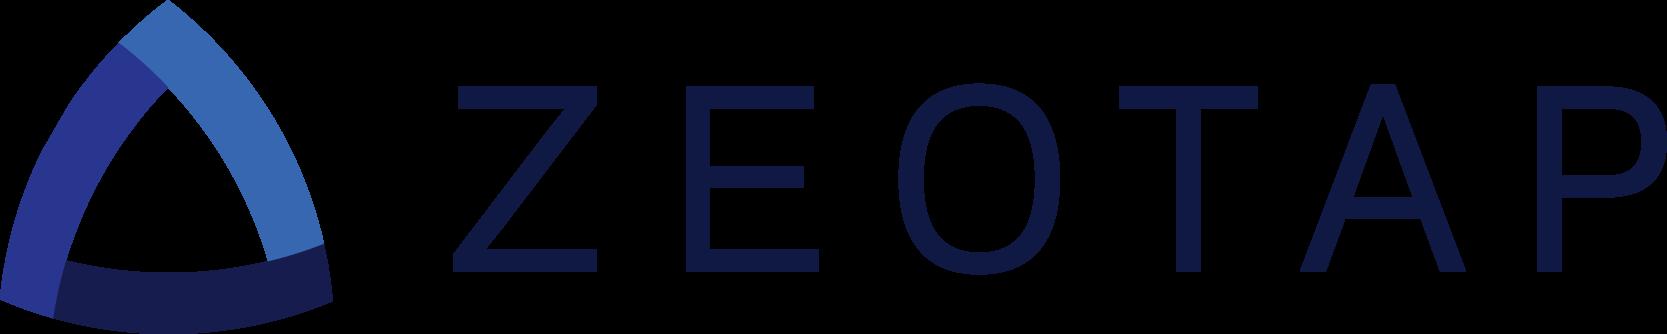 Zeotap Customer Data Platform logo